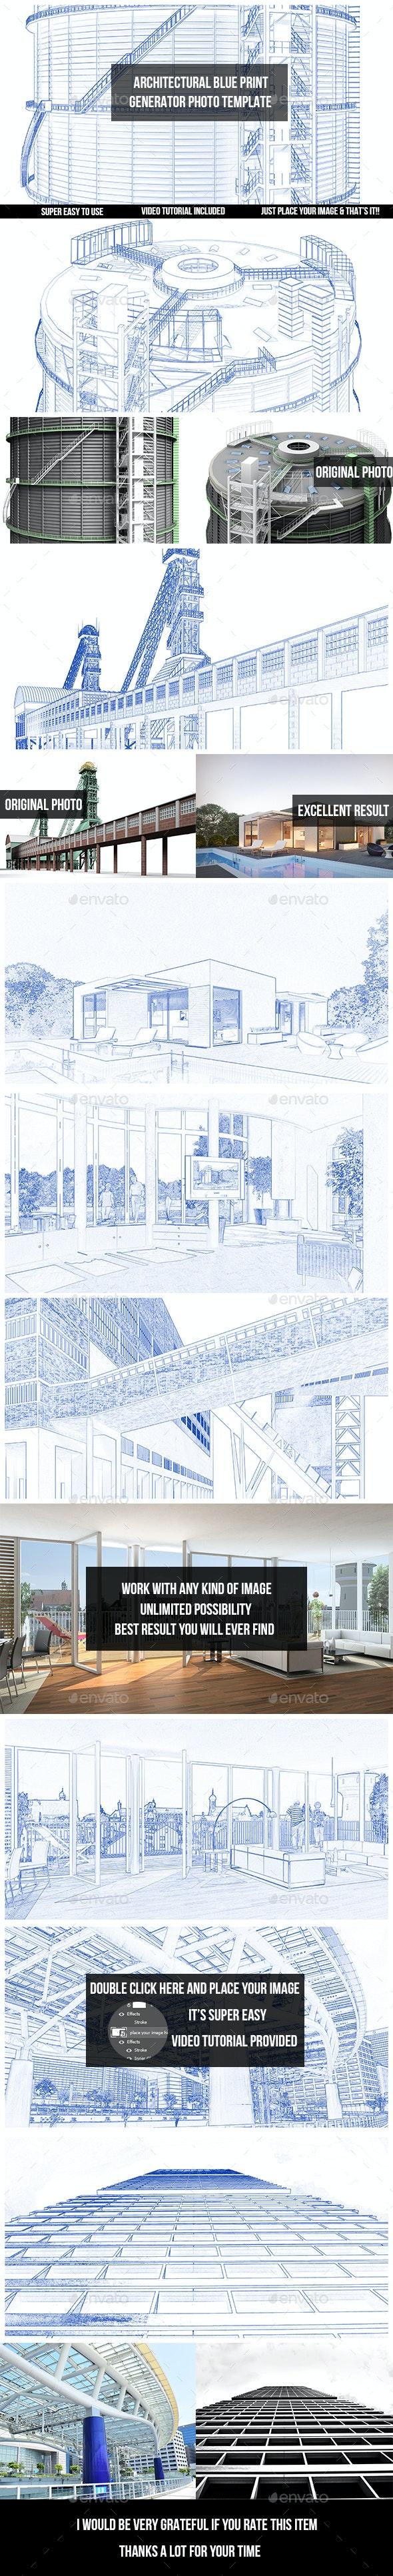 Architectural Blueprint Generator - Photo Template - Photo Templates Graphics